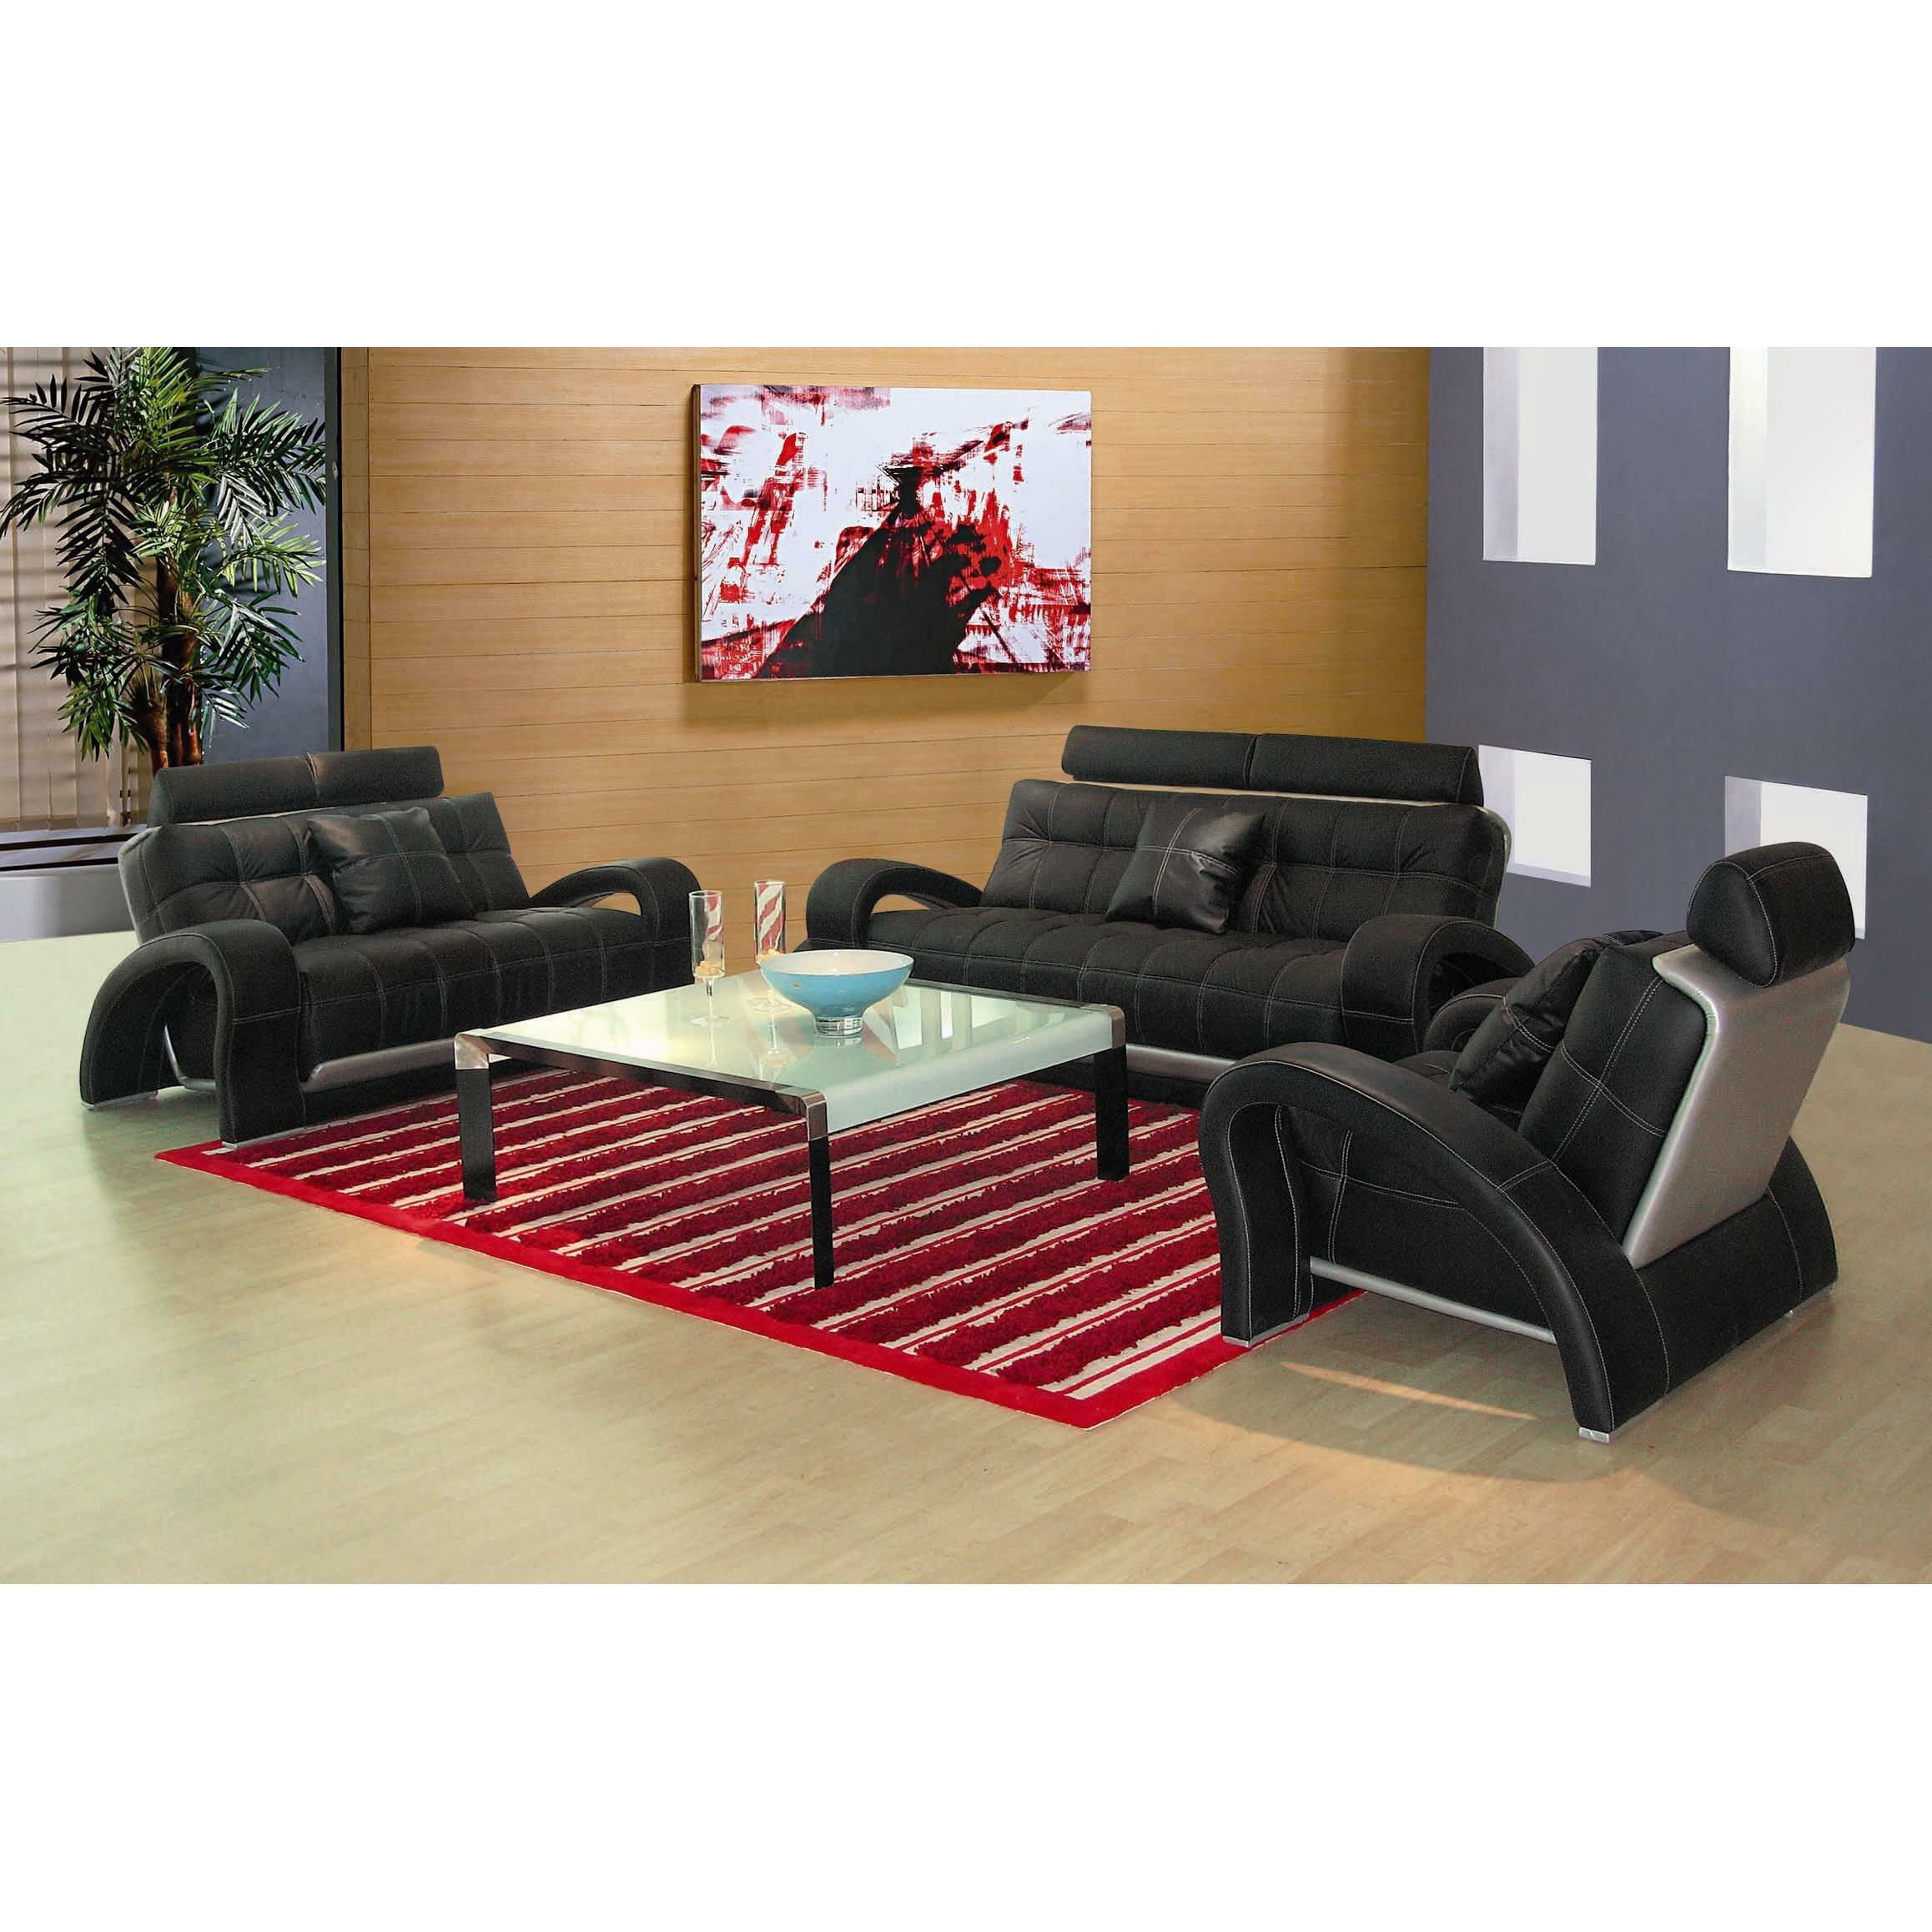 Hokku designs arthur 3 piece leather sofa set reviews for 3 piece couch set